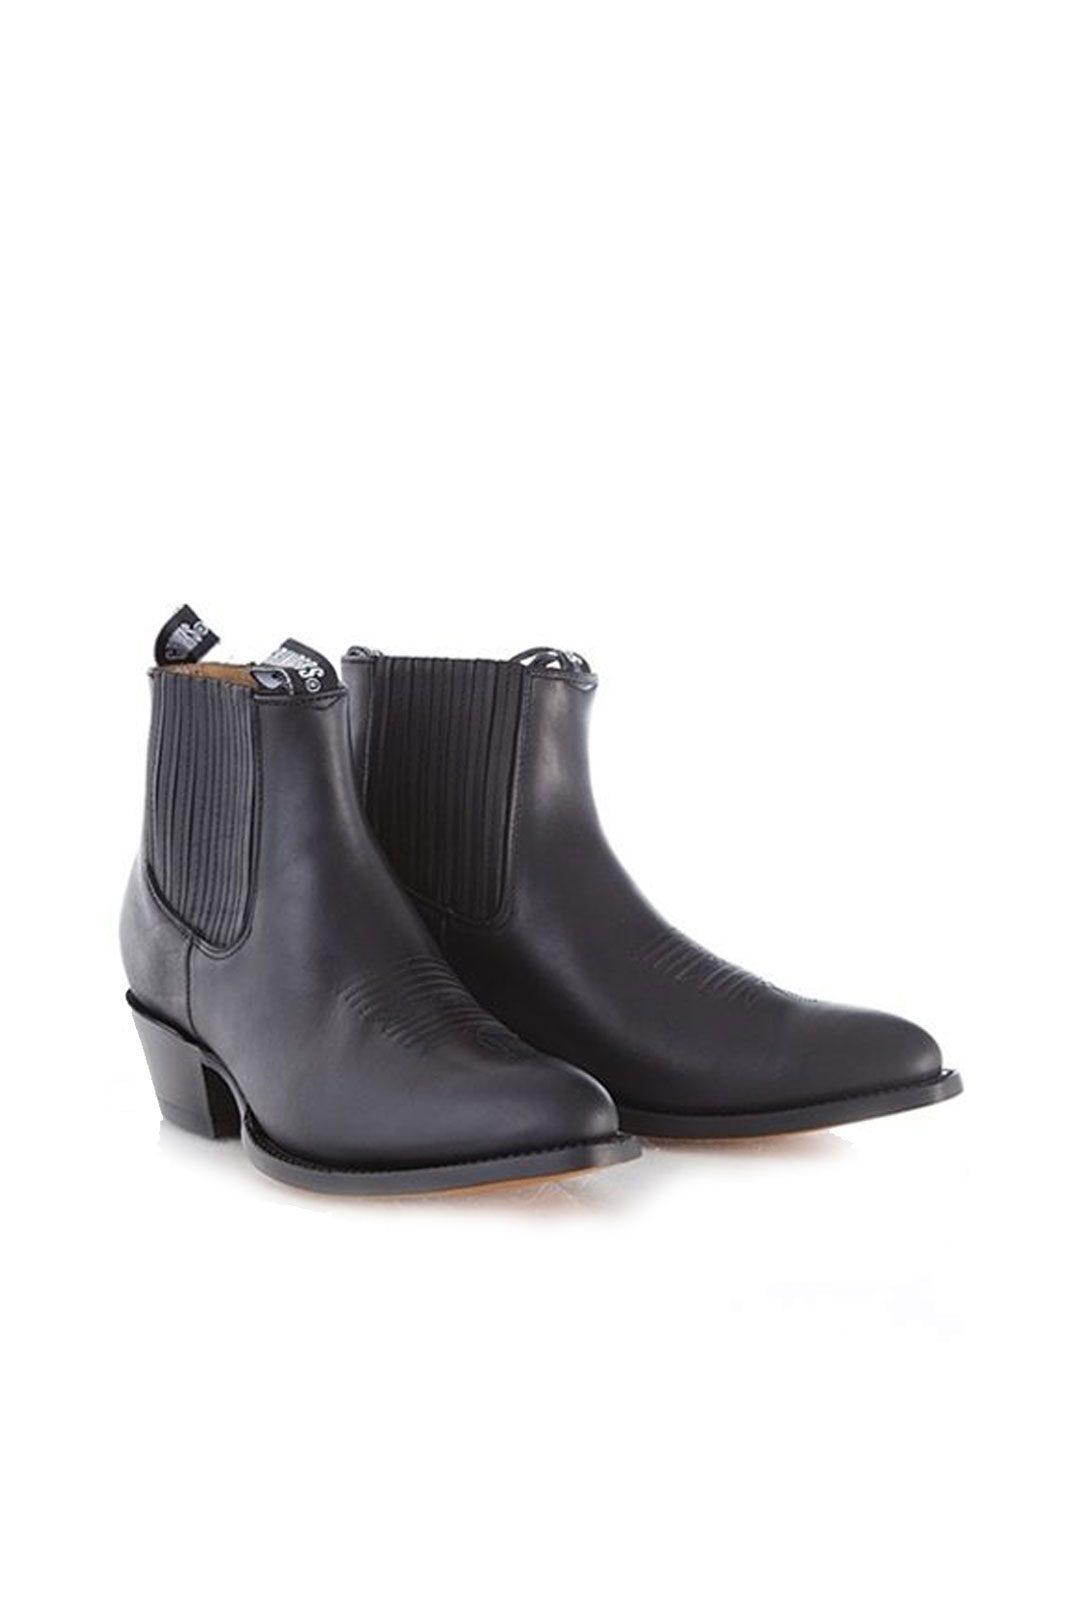 grinders boots maverick